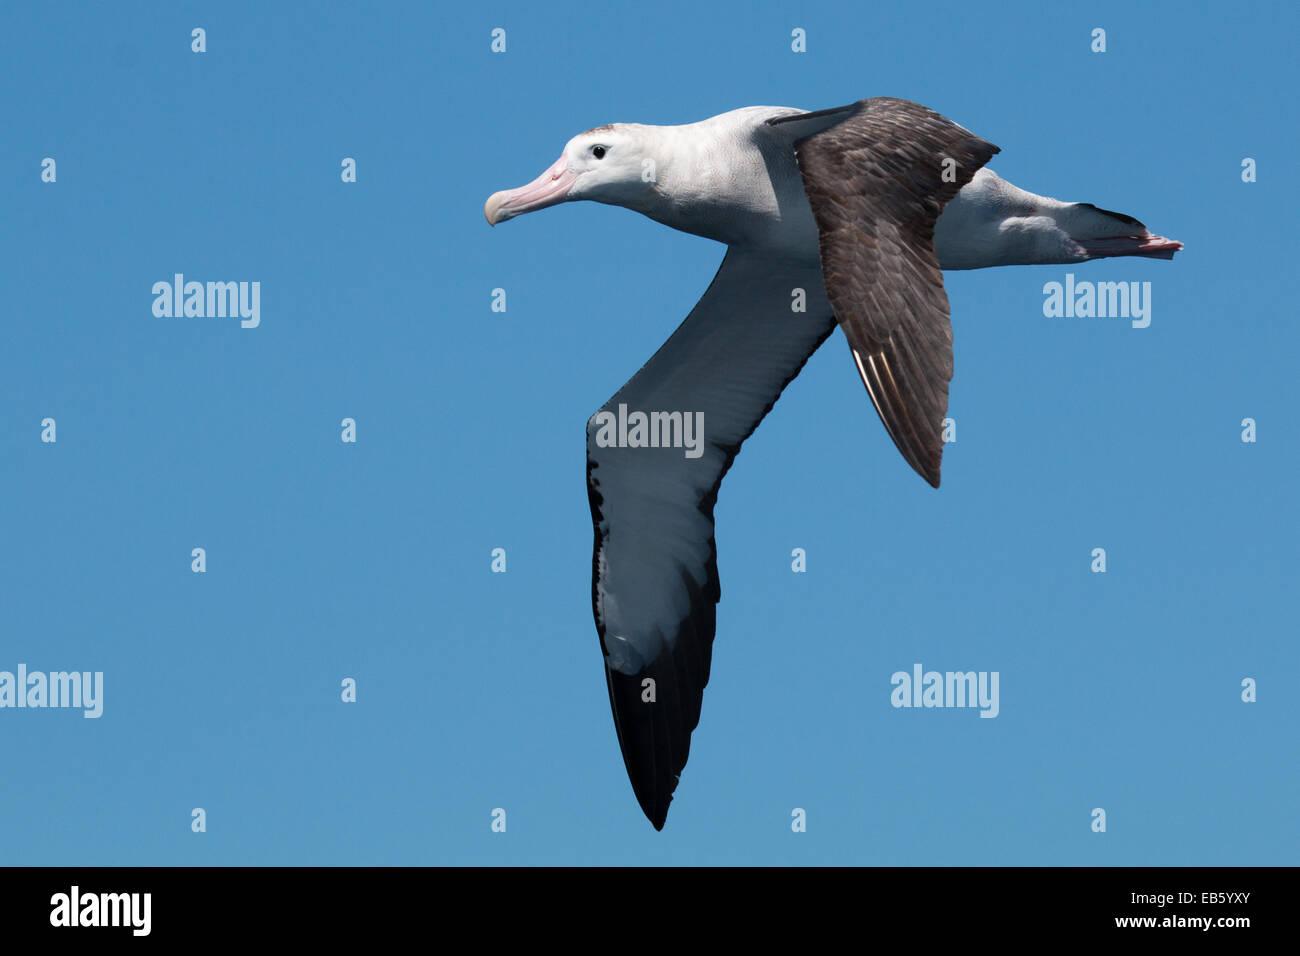 Wandering Albatross (Diomedea exulans) in flight - Stock Image